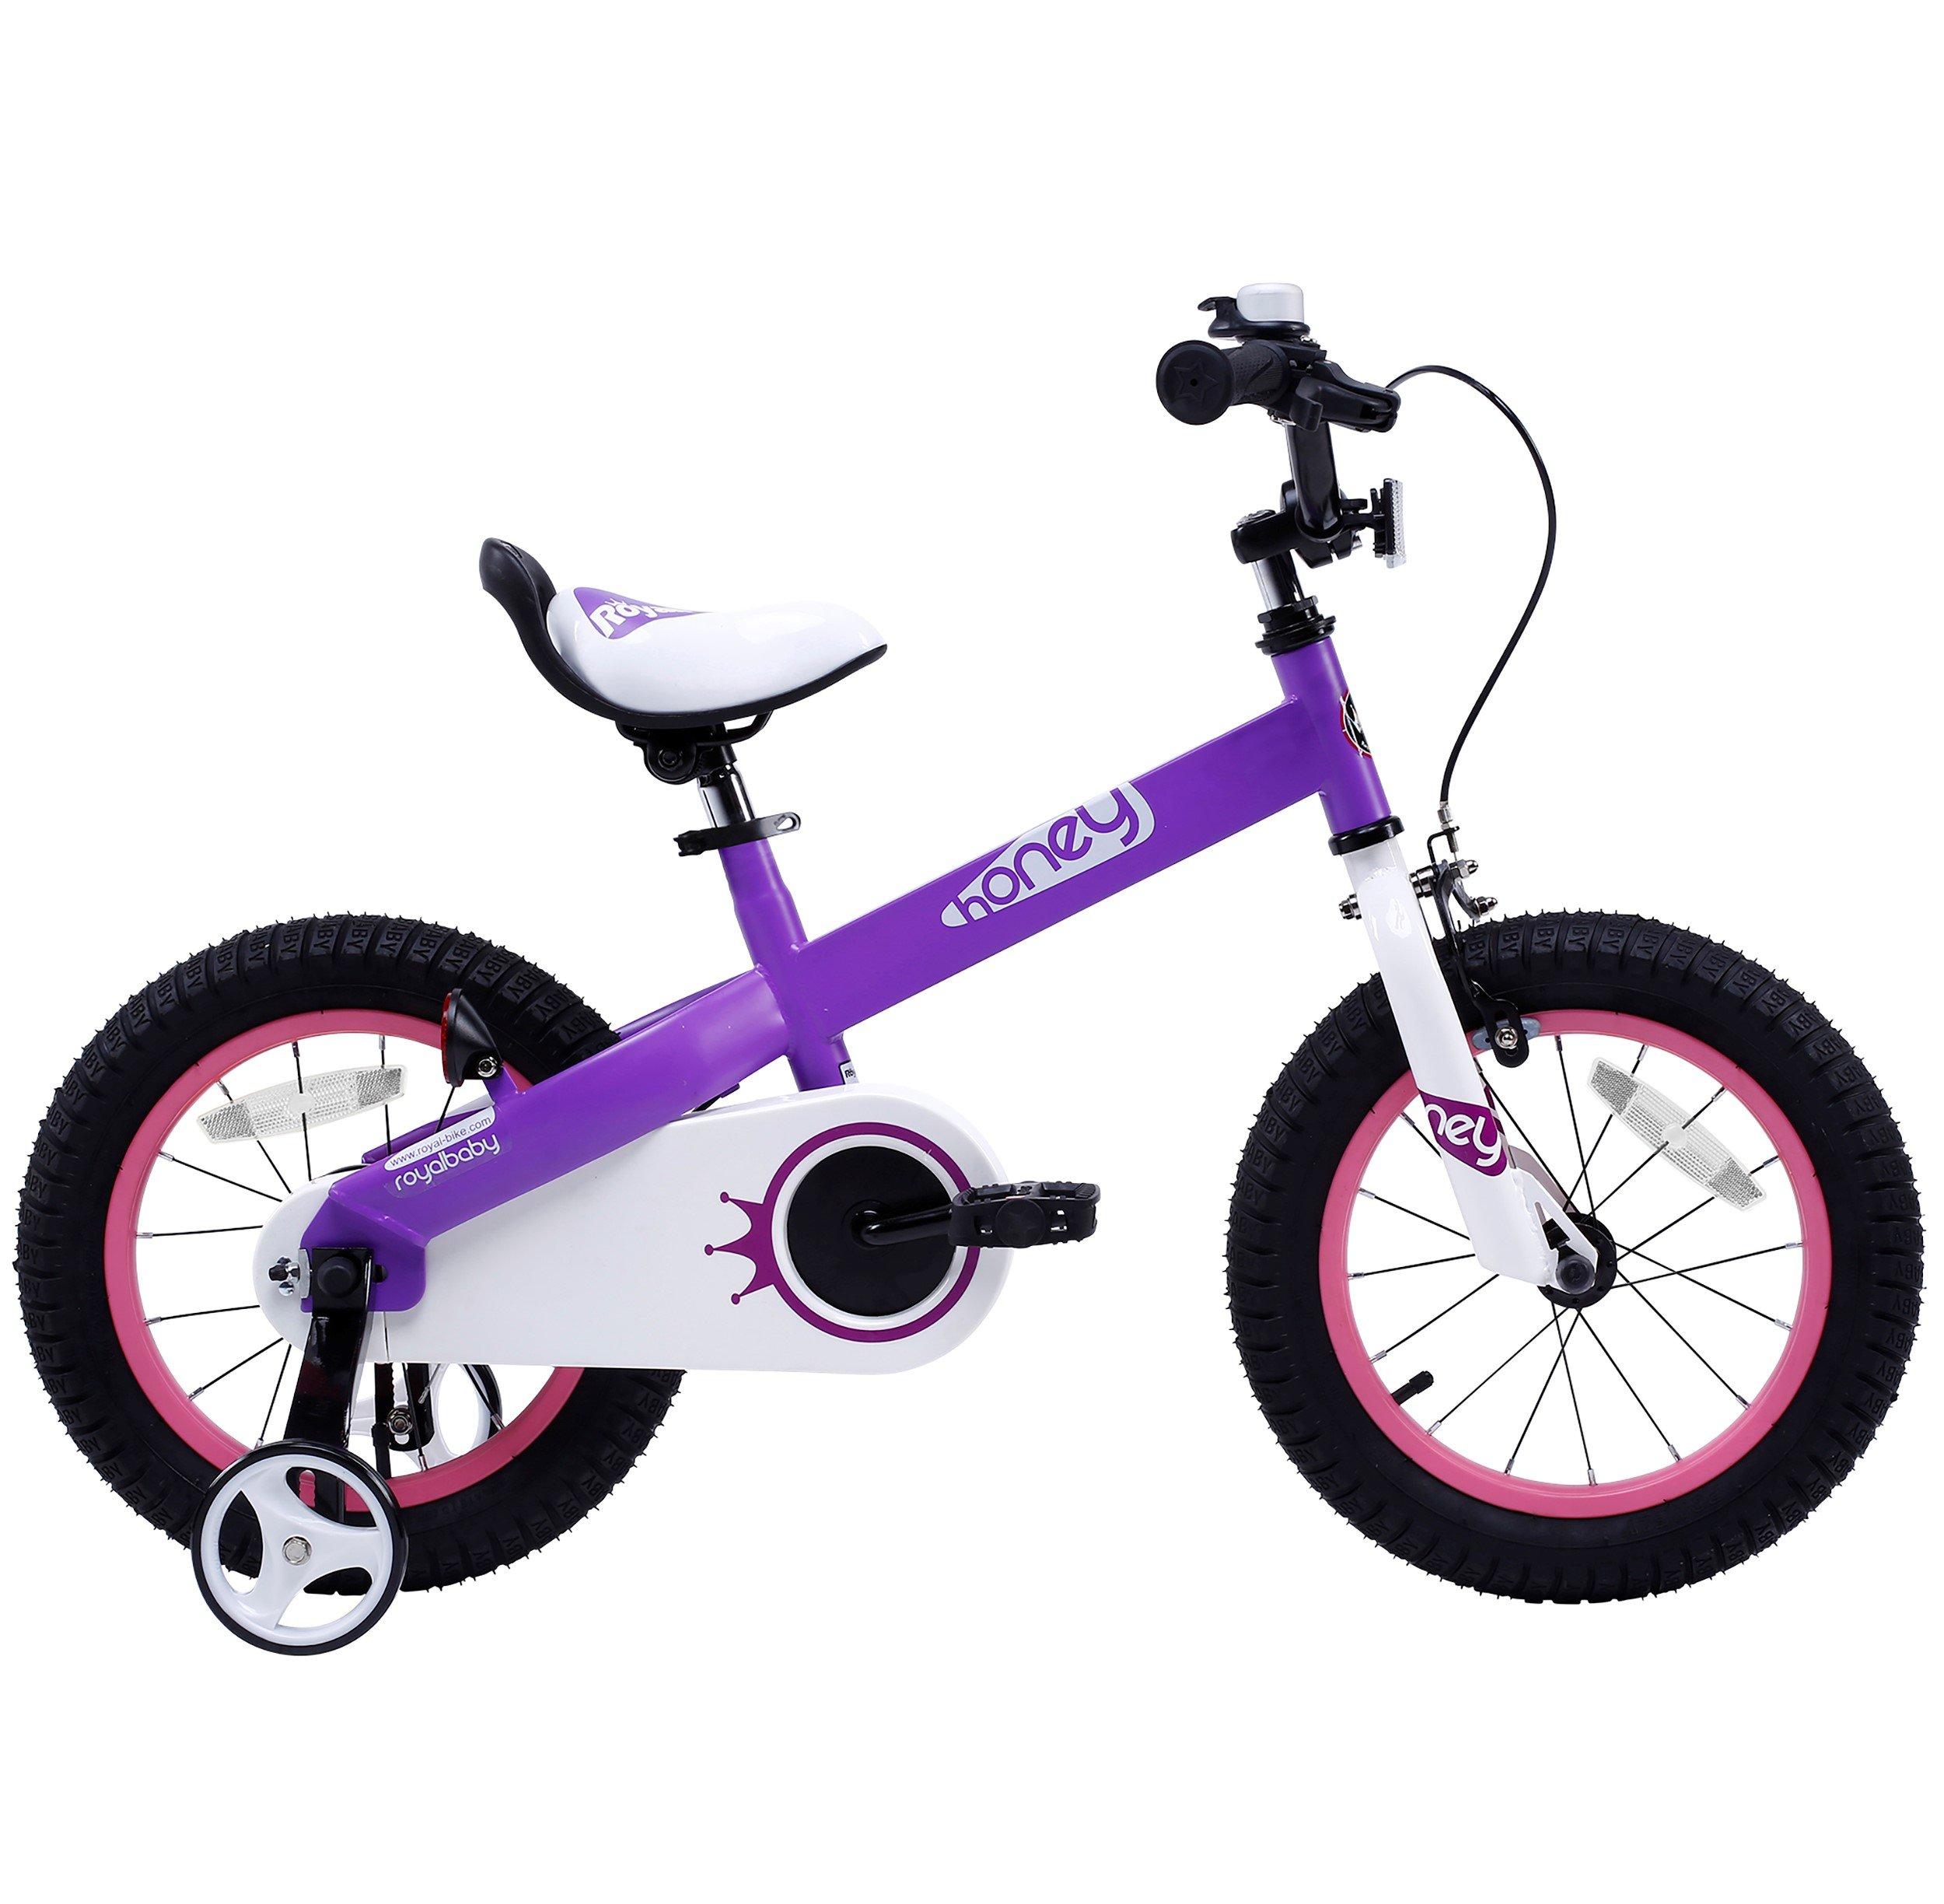 Royalbaby CubeTube Honey 12'' Bicycle for Kids, Red